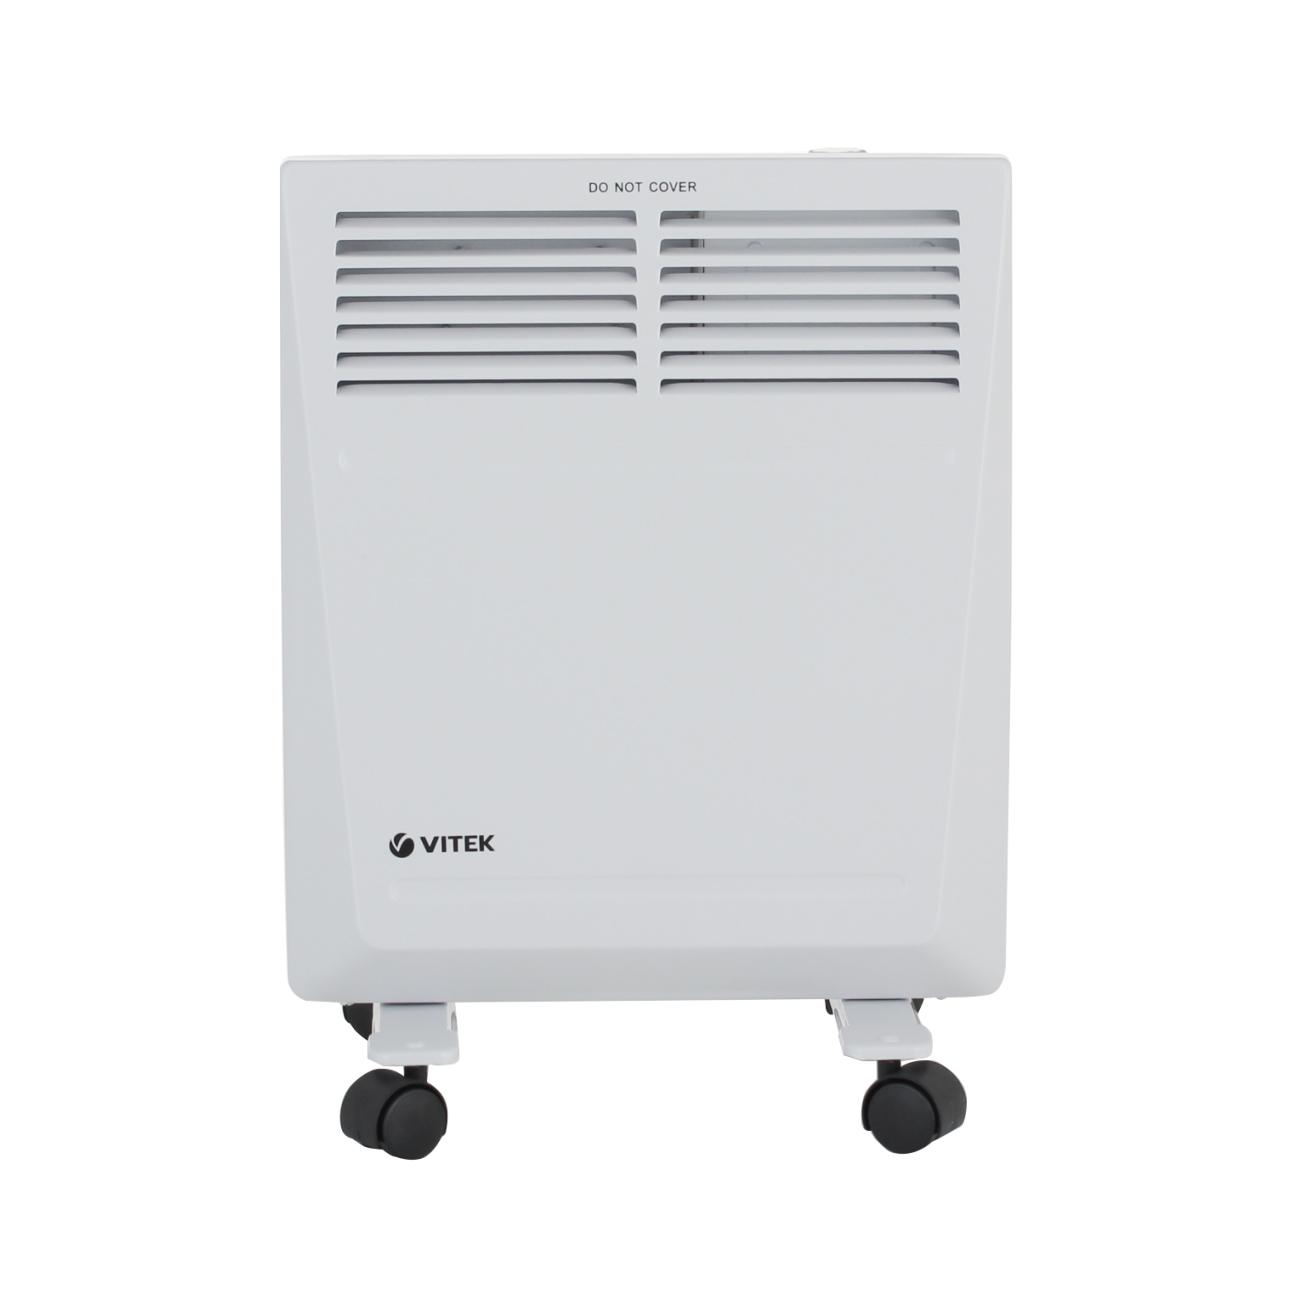 Конвектор Vitek VT 2171 W белый